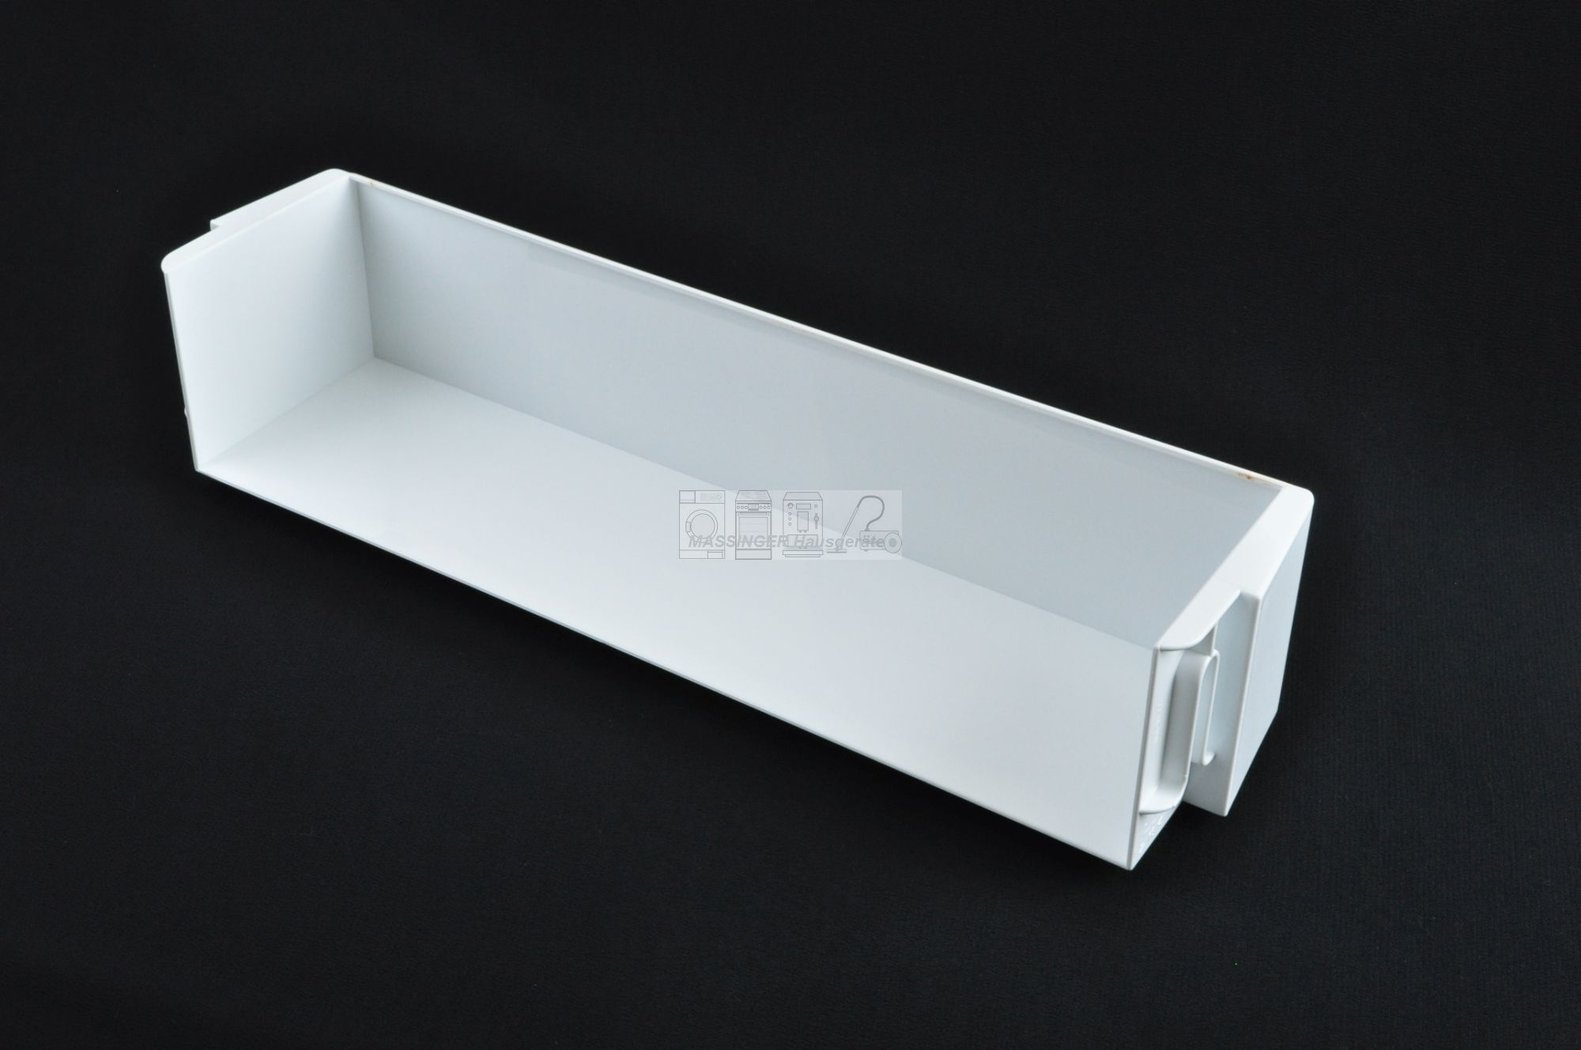 Amica Kühlschrank 50 Cm Breit : Kühlschrank cm breit amica induktions standherd shi e a